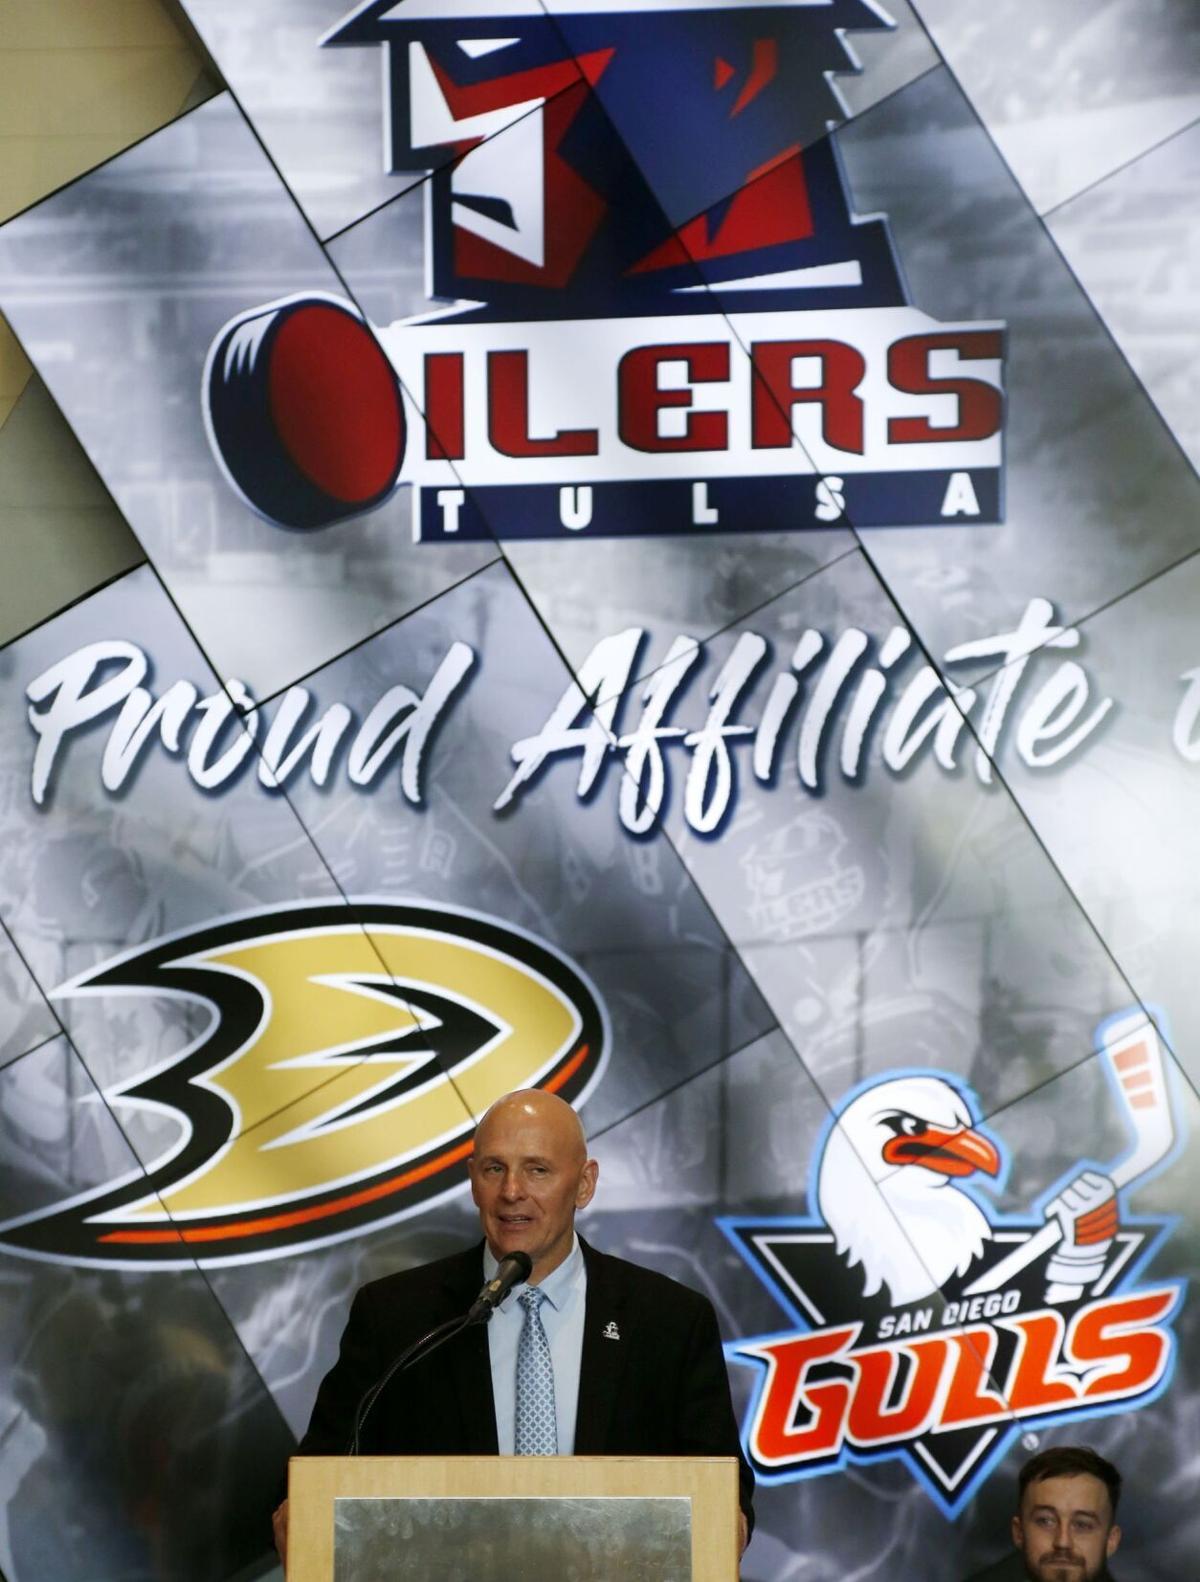 Oilers (copy)